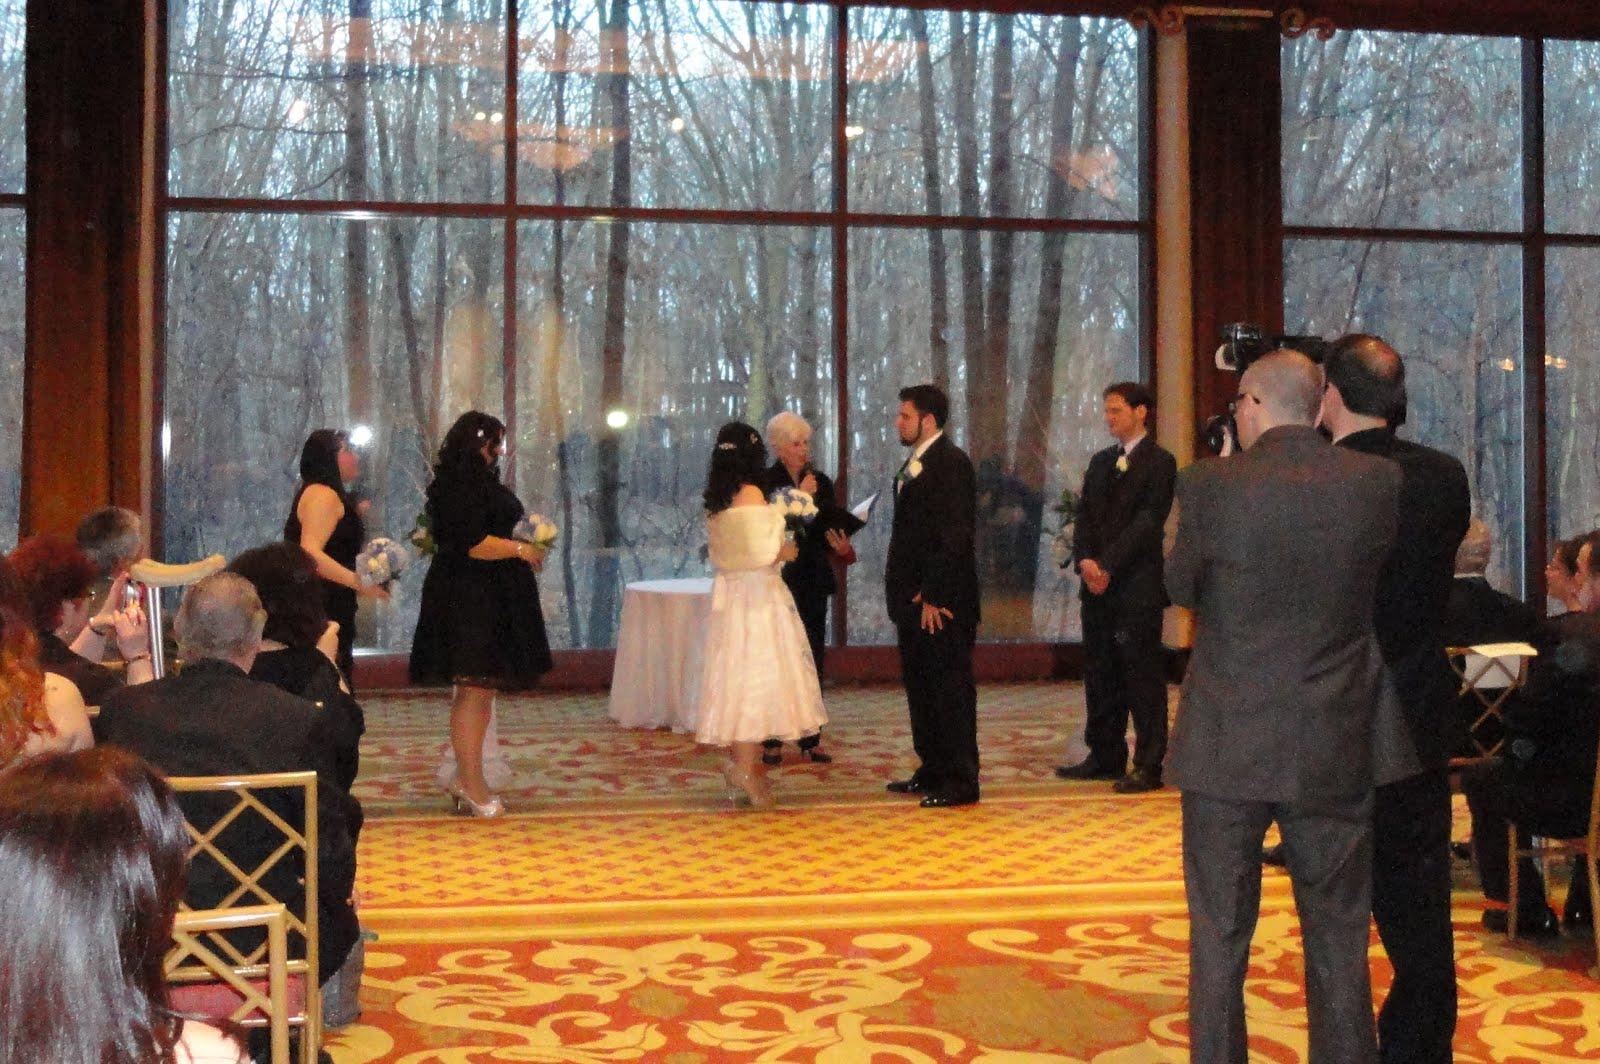 Julie Laudicina Wedding Officiant Ny Nj March 2012